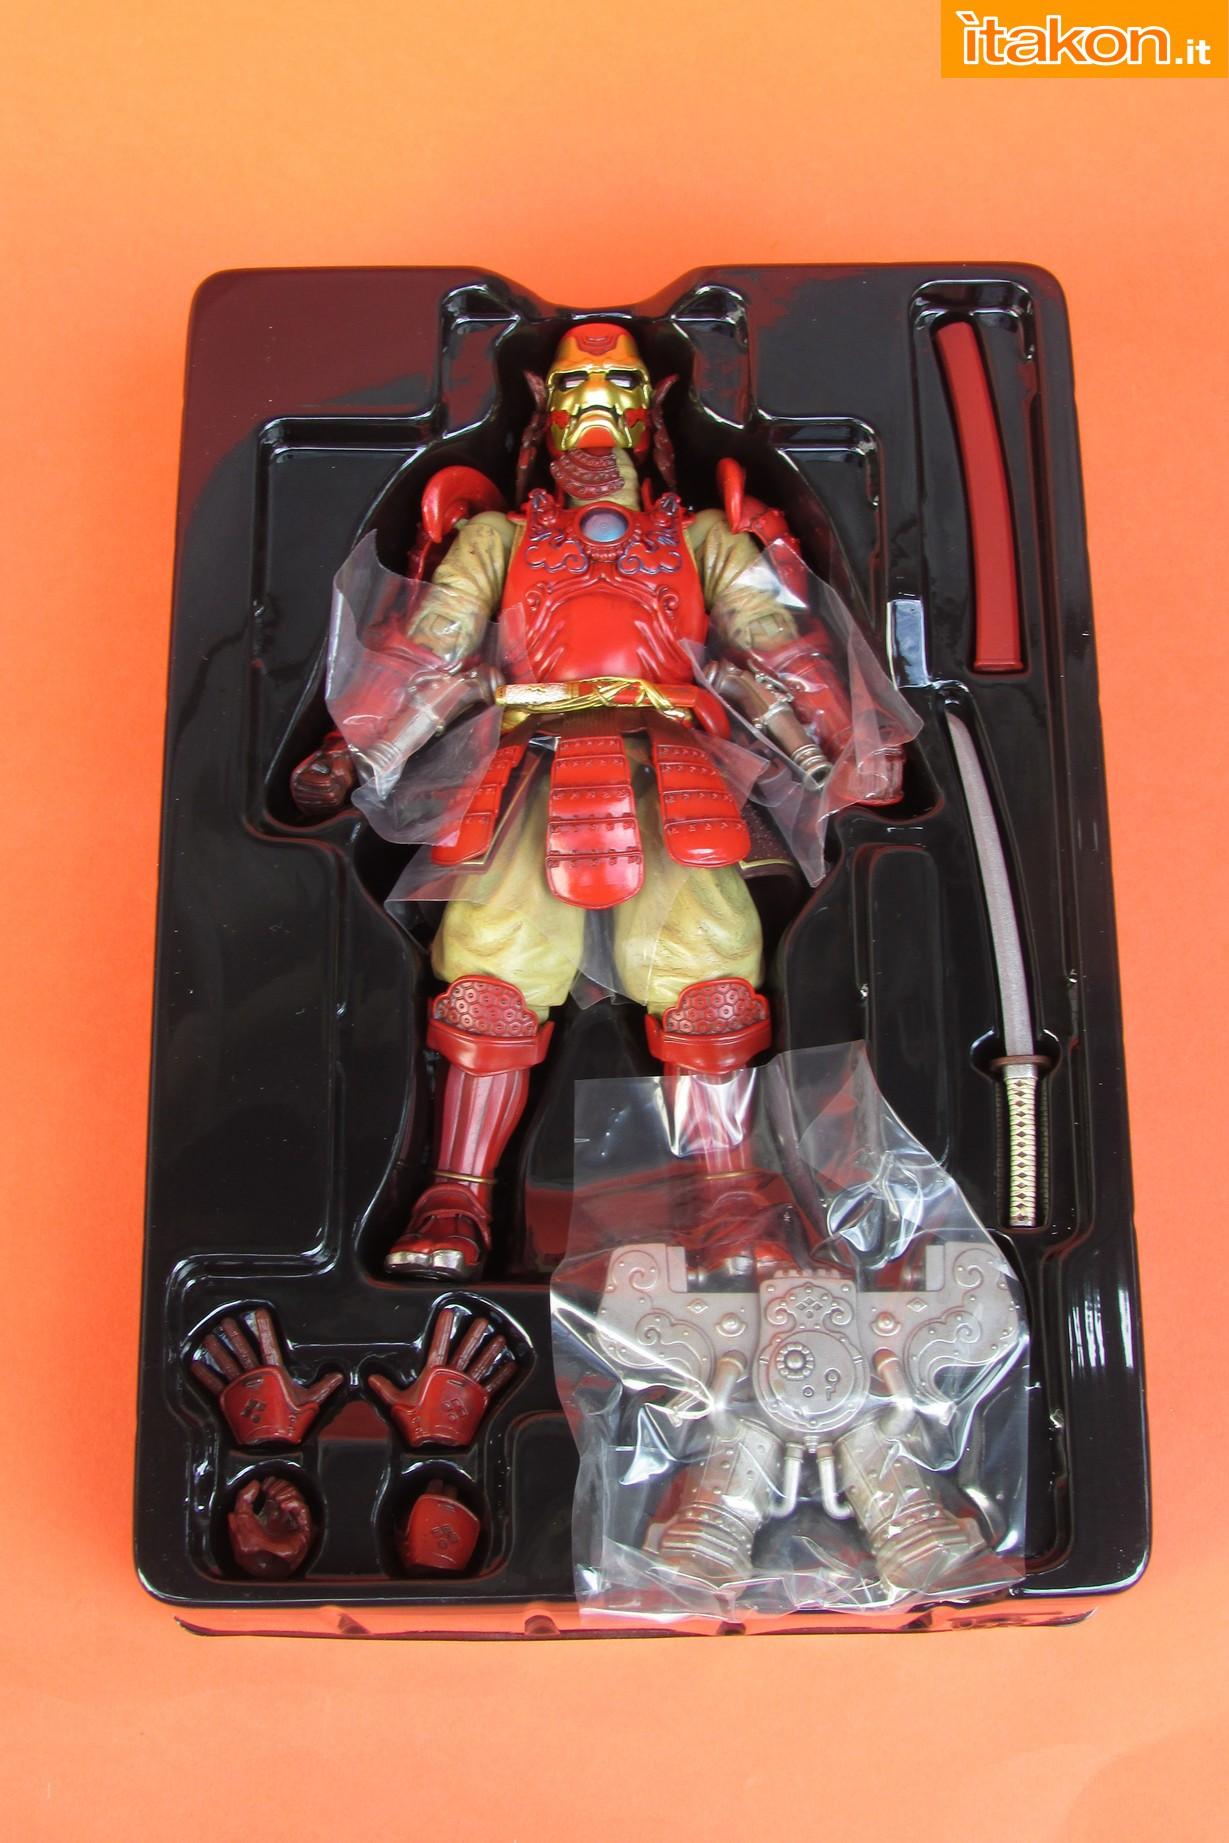 Link a Marvel Comics Koutetsu Samurai Iron Man Mark 3 Meishou MANGA REALIZATION review Bandai Itakon.it10